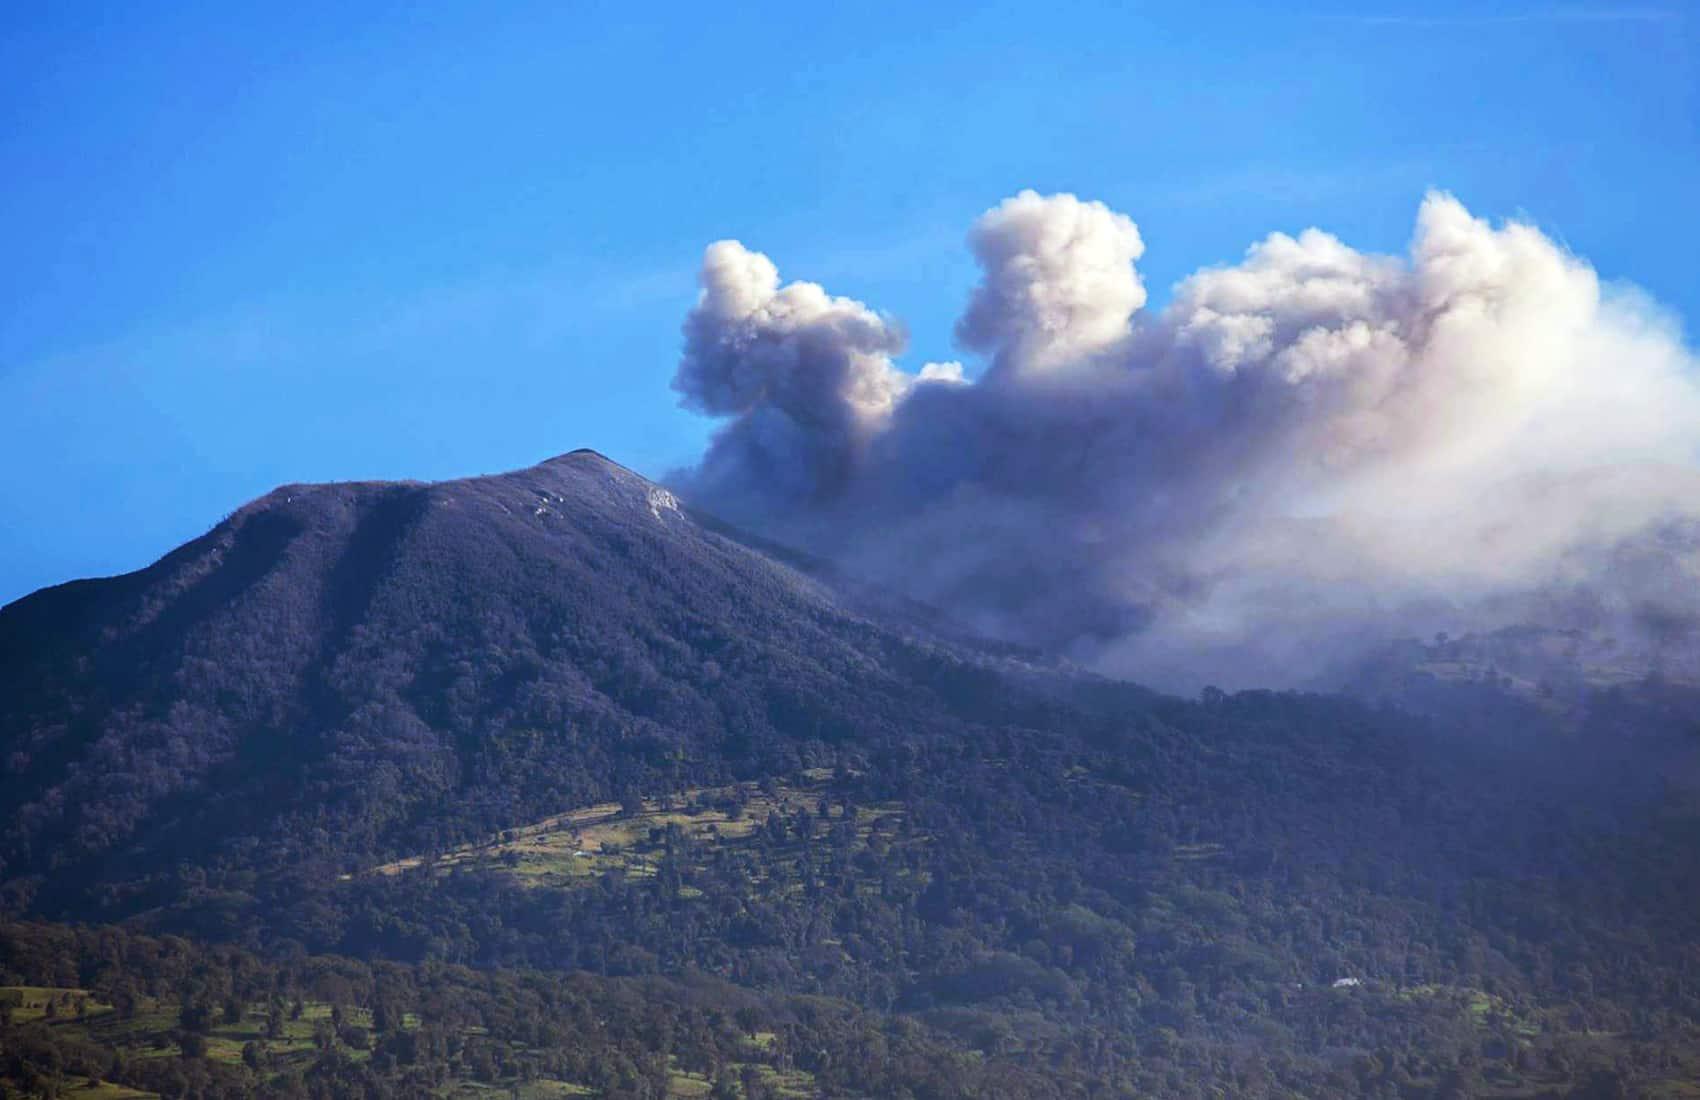 Ash explosion at Turrialba Volcano. Mar. 29, 2017.